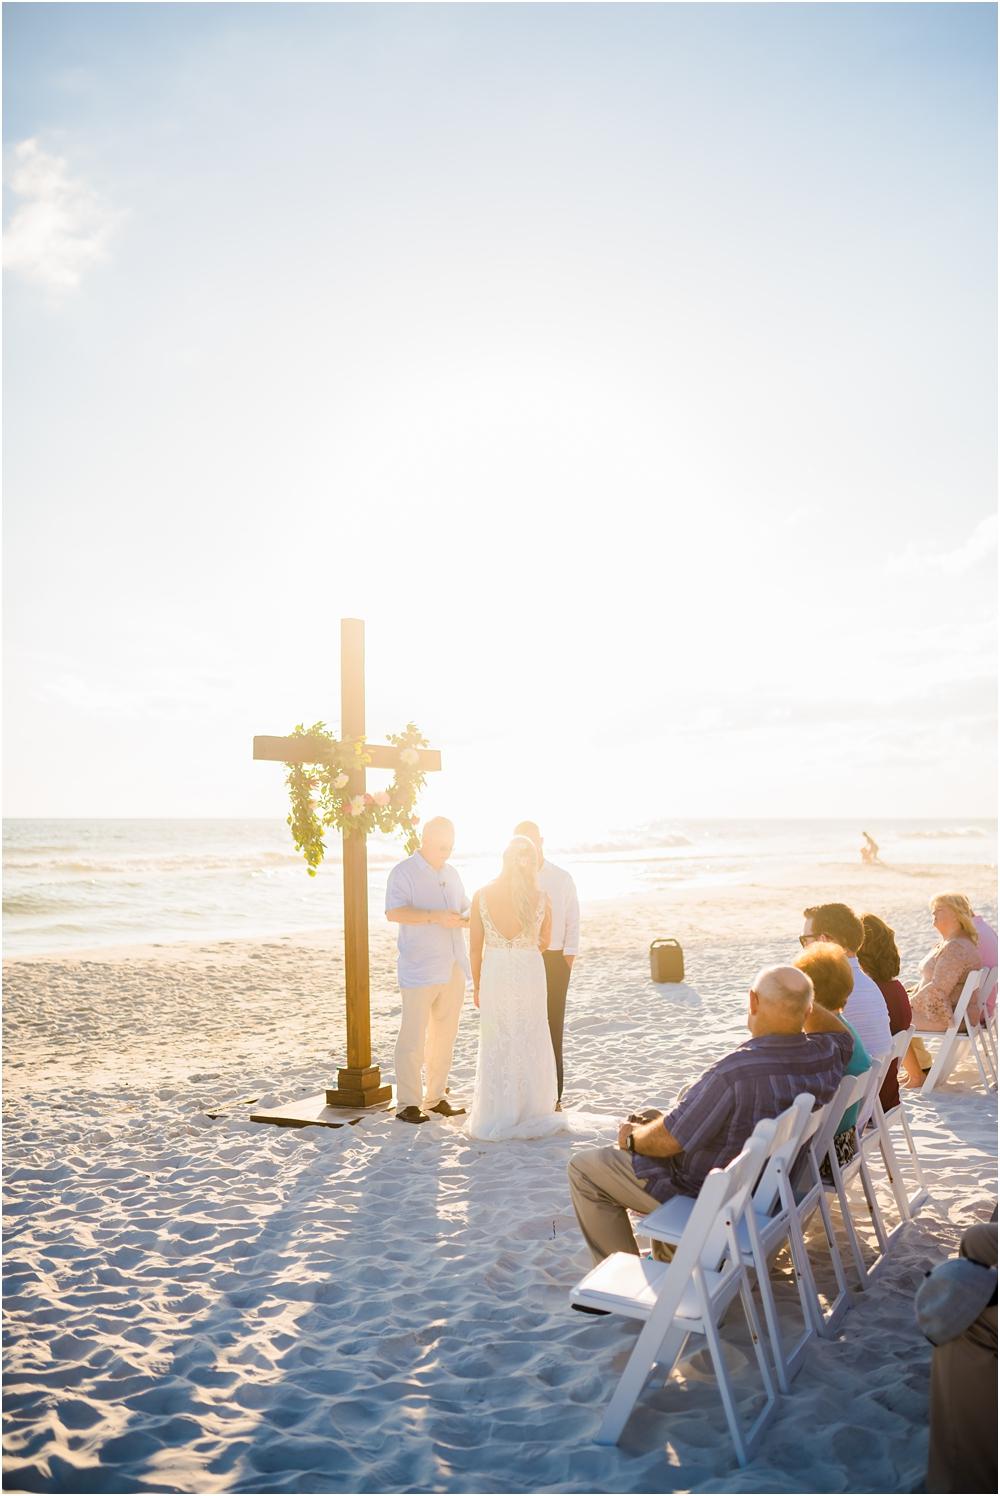 mcglothlin-wedding-kiersten-stevenson-photography-30a-panama-city-beach-dothan-tallahassee-(84-of-145).jpg